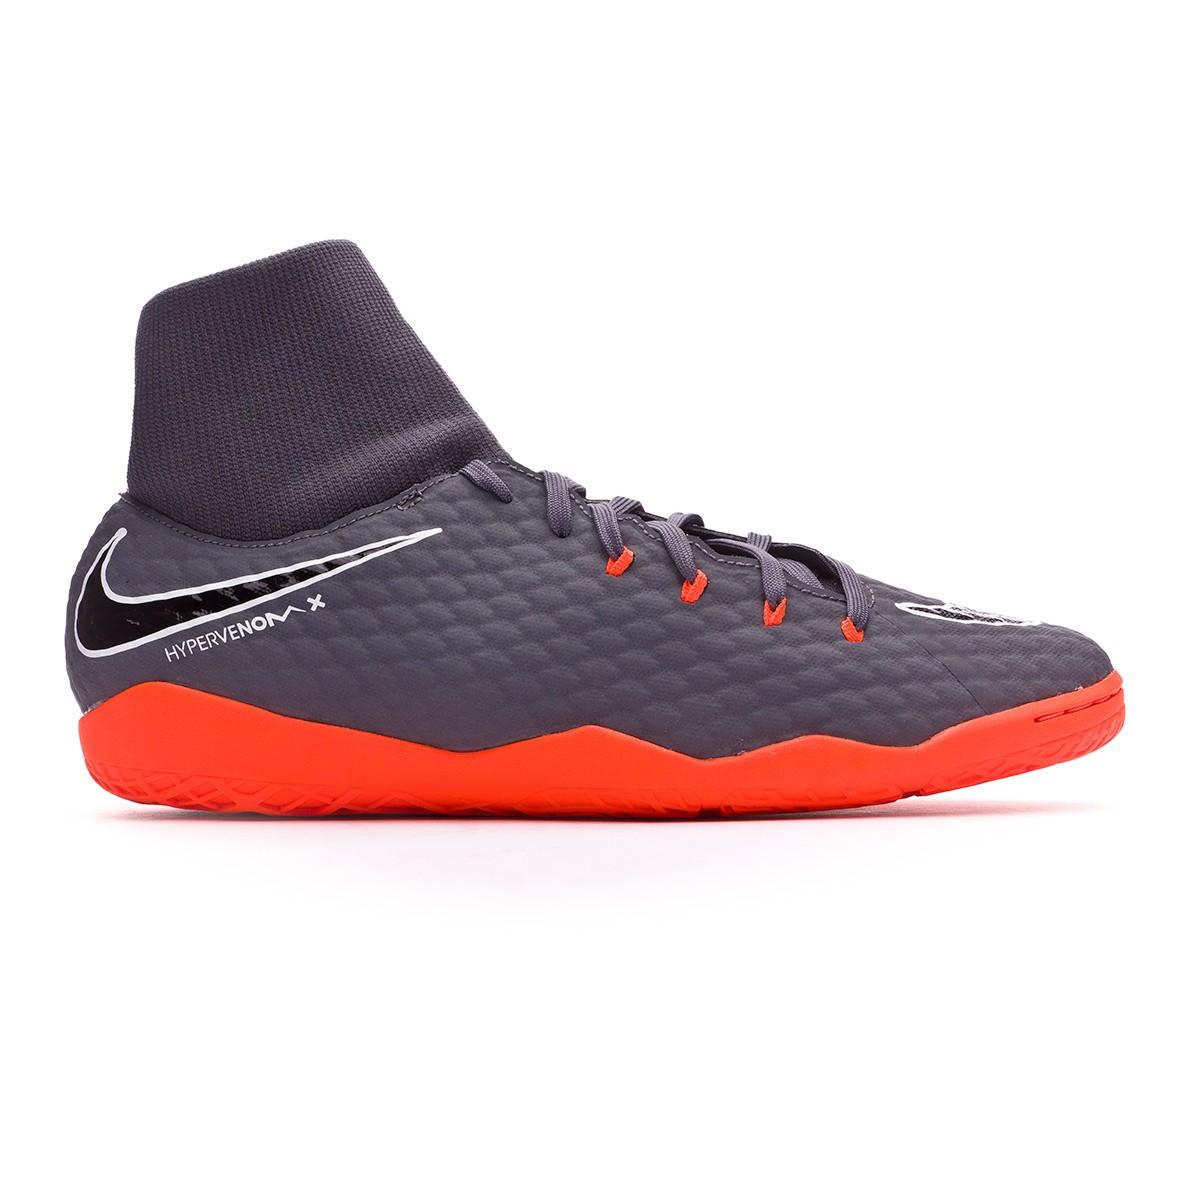 324c5c2326a0 Futsal Boot Nike Hypervenom PhantomX III Academy DF IC Dark grey-Total  orange-White - Tienda de fútbol Fútbol Emotion